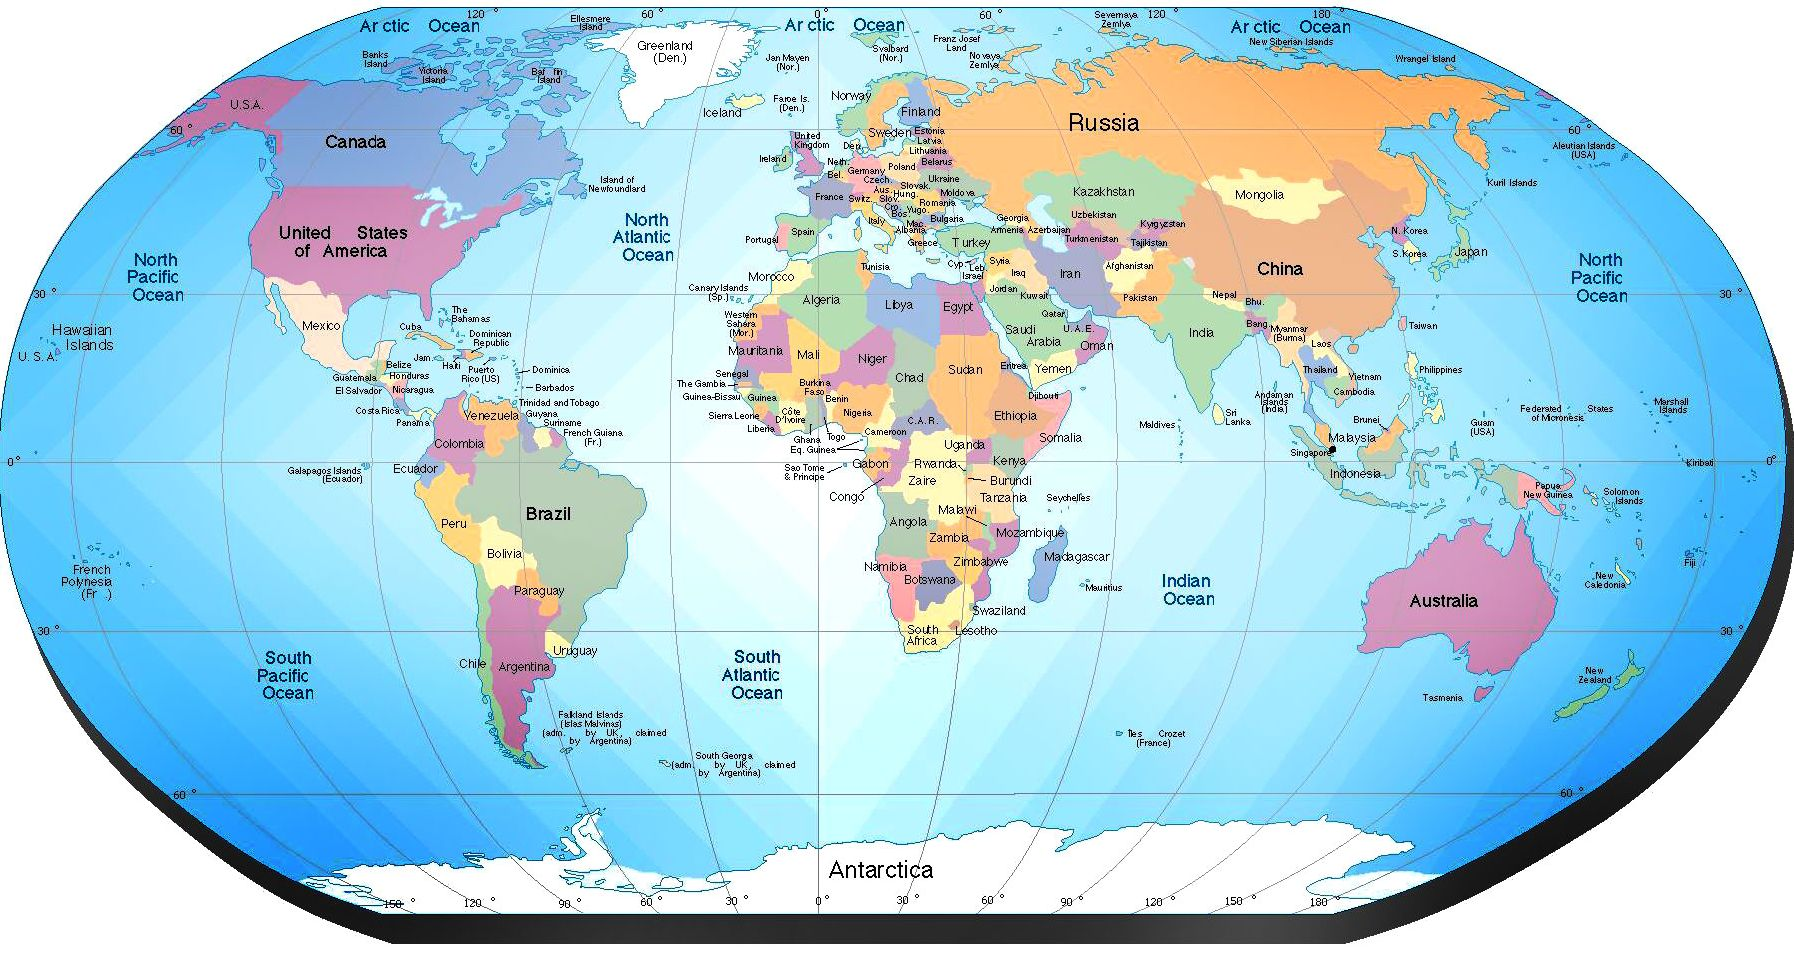 Mapa Del Mundo Paises Hd.Tierra 3 Mapa Politico Del Mundo Mapa Paises Y Mapas Del